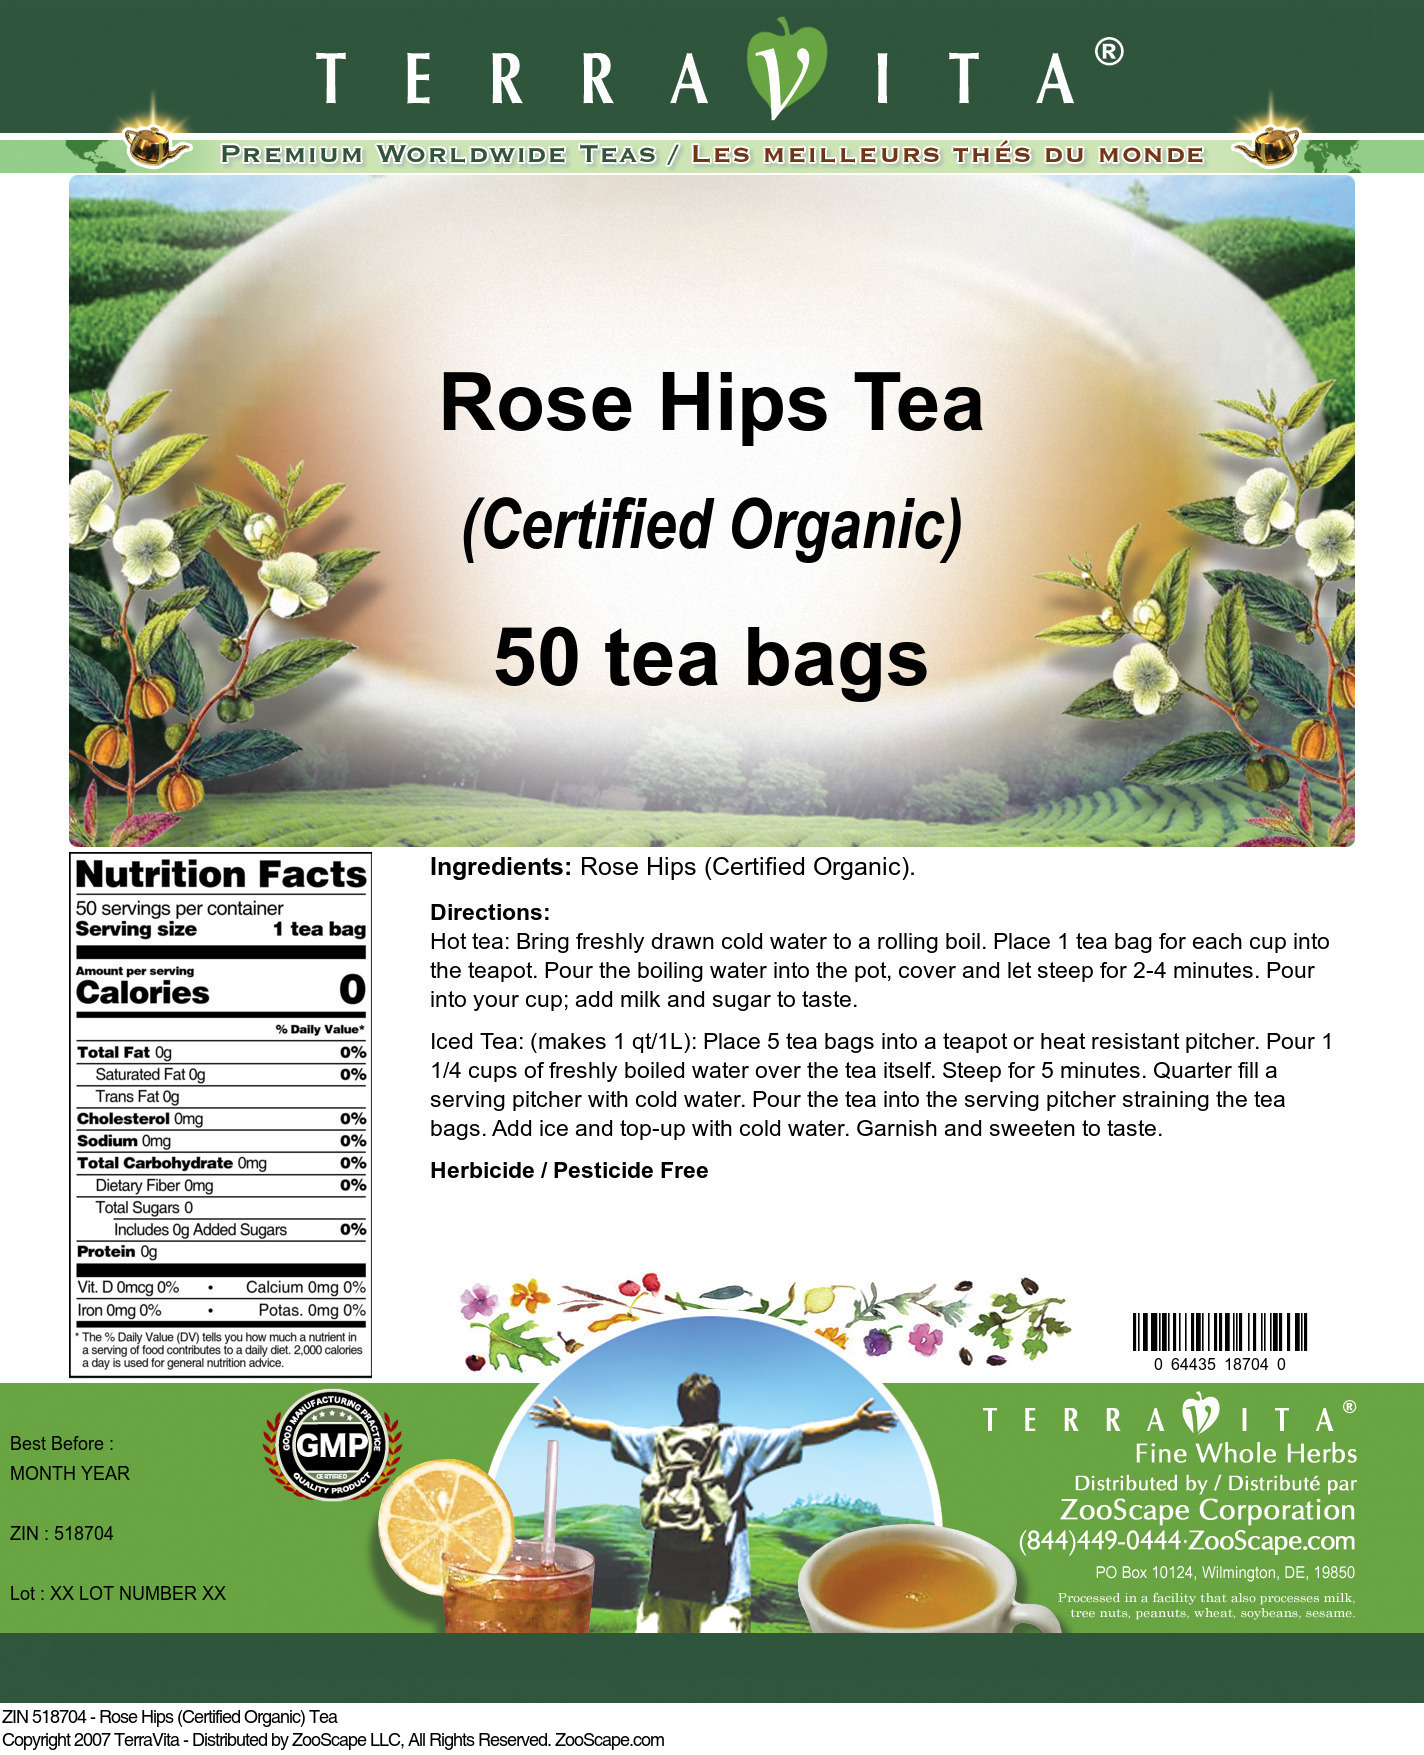 Rose Hips (Certified Organic) Tea